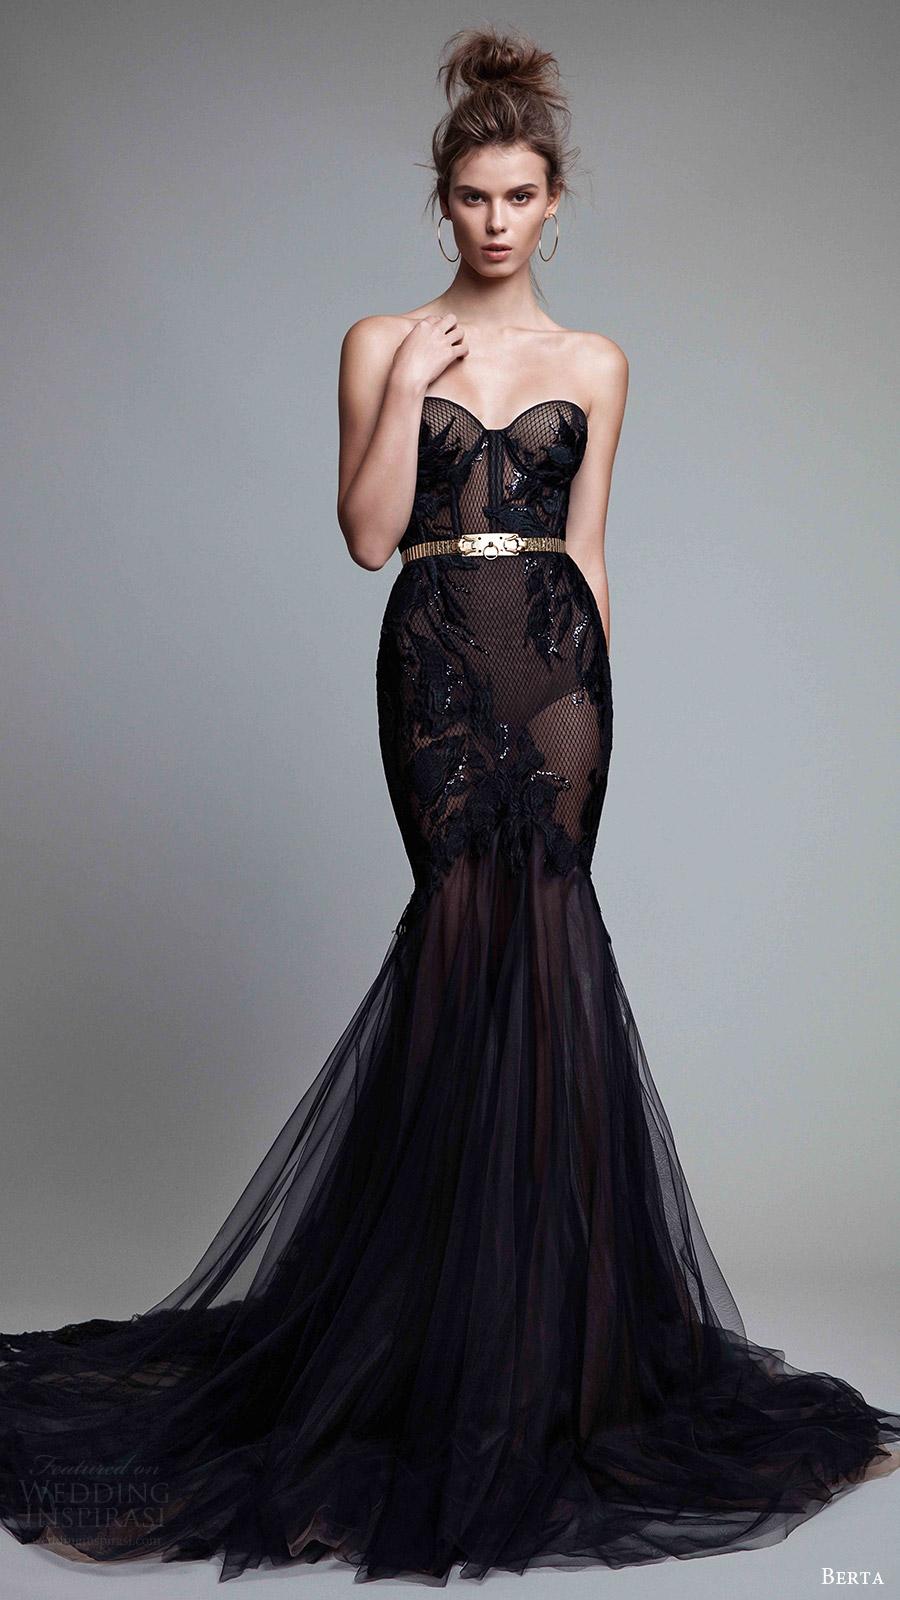 berta rtw fall 2017 (17 23) strapless sweetheart mermaid embellished black evening dress mv